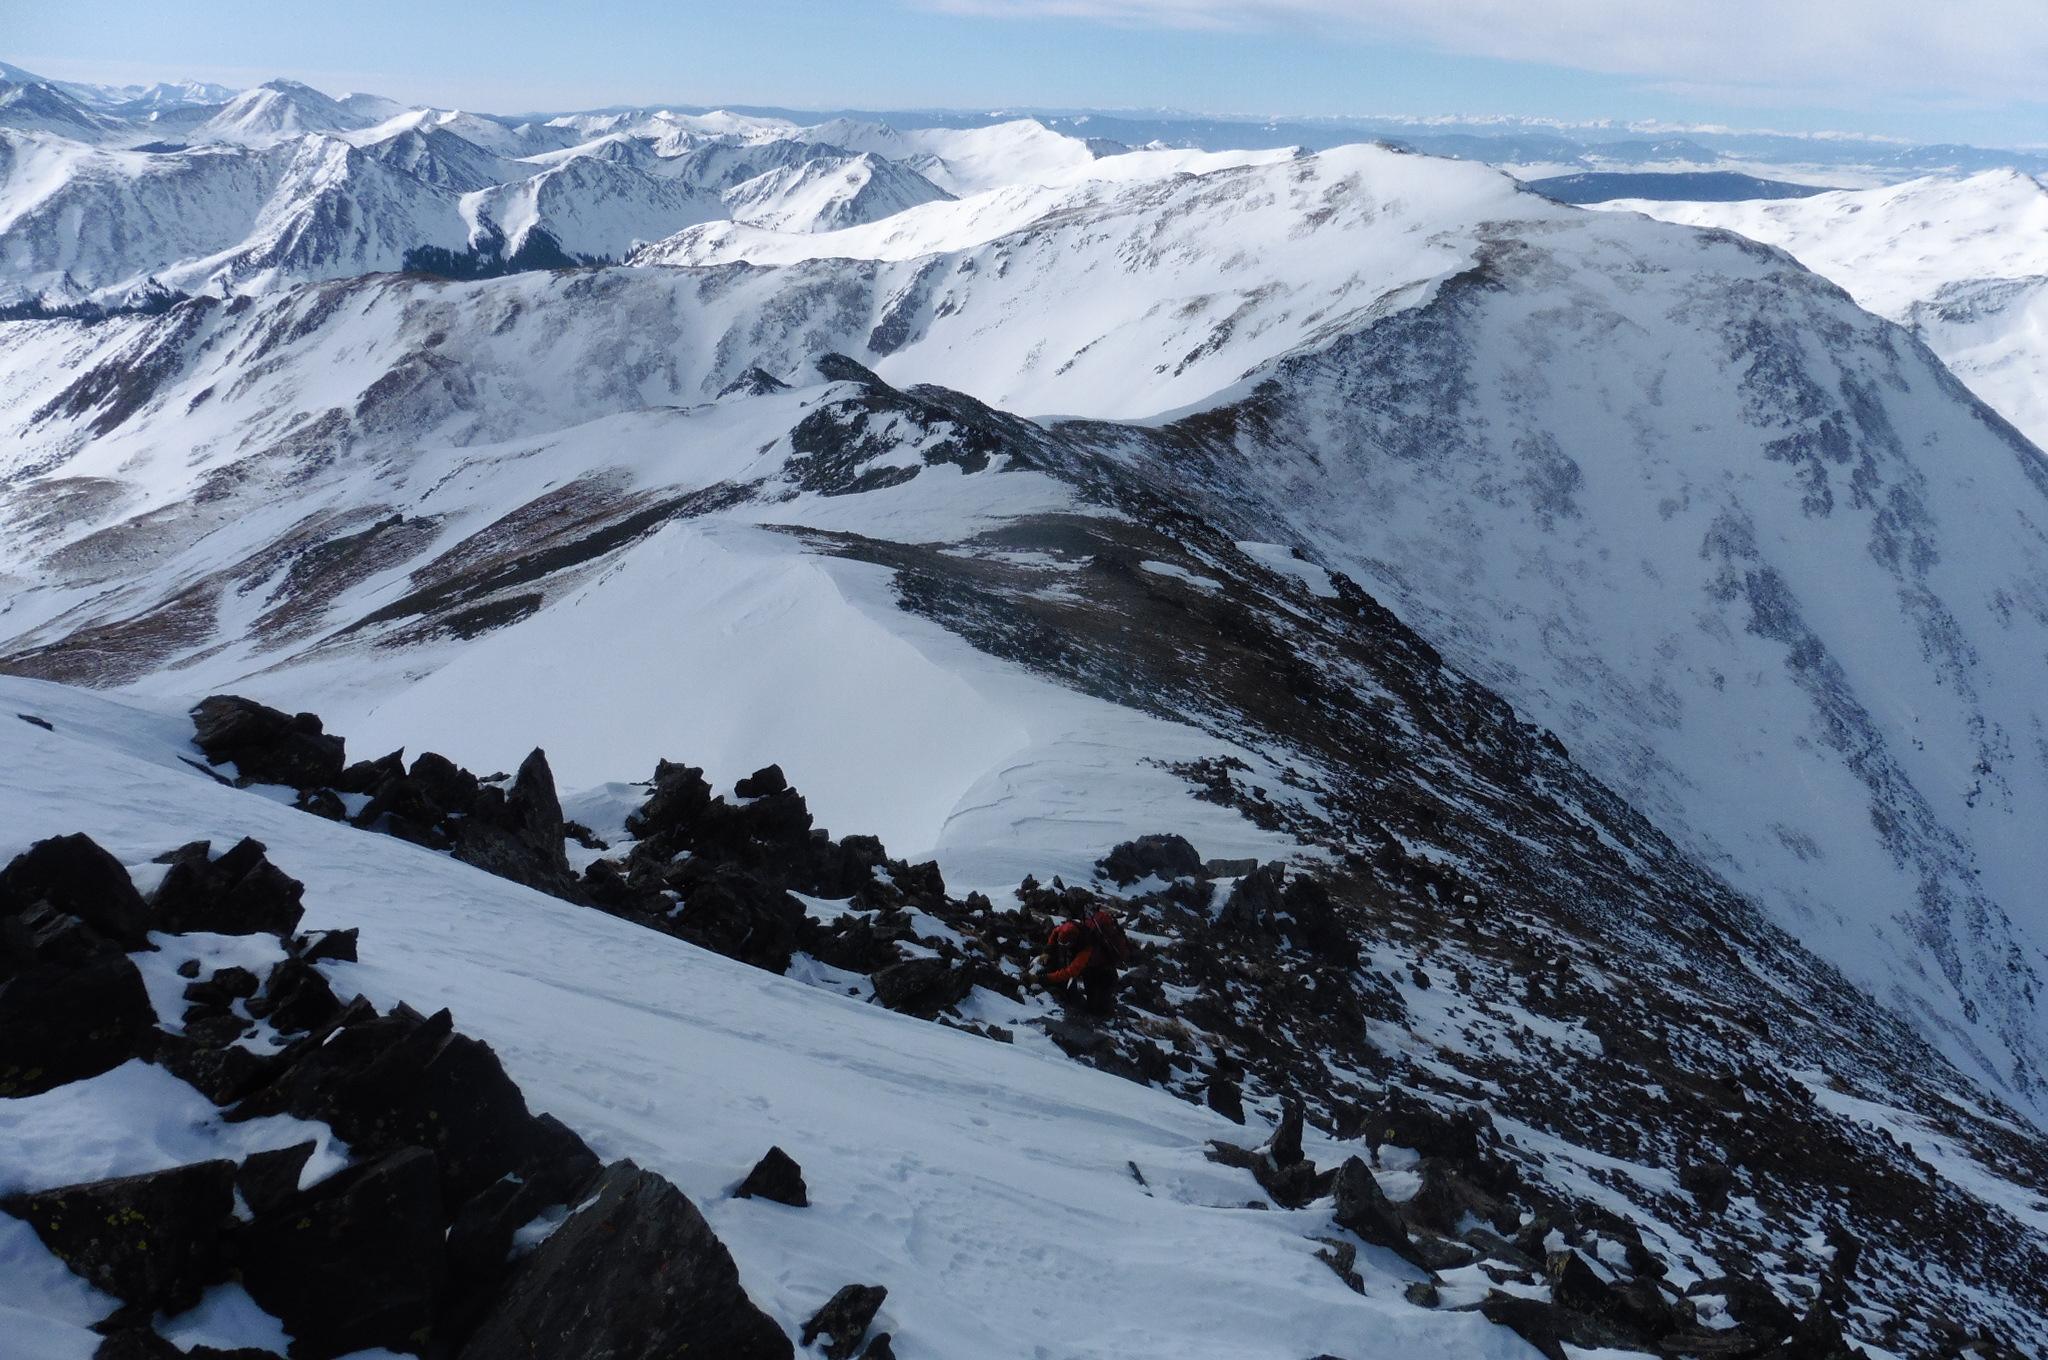 Colin climbing to the summit ridge on Emma Burr